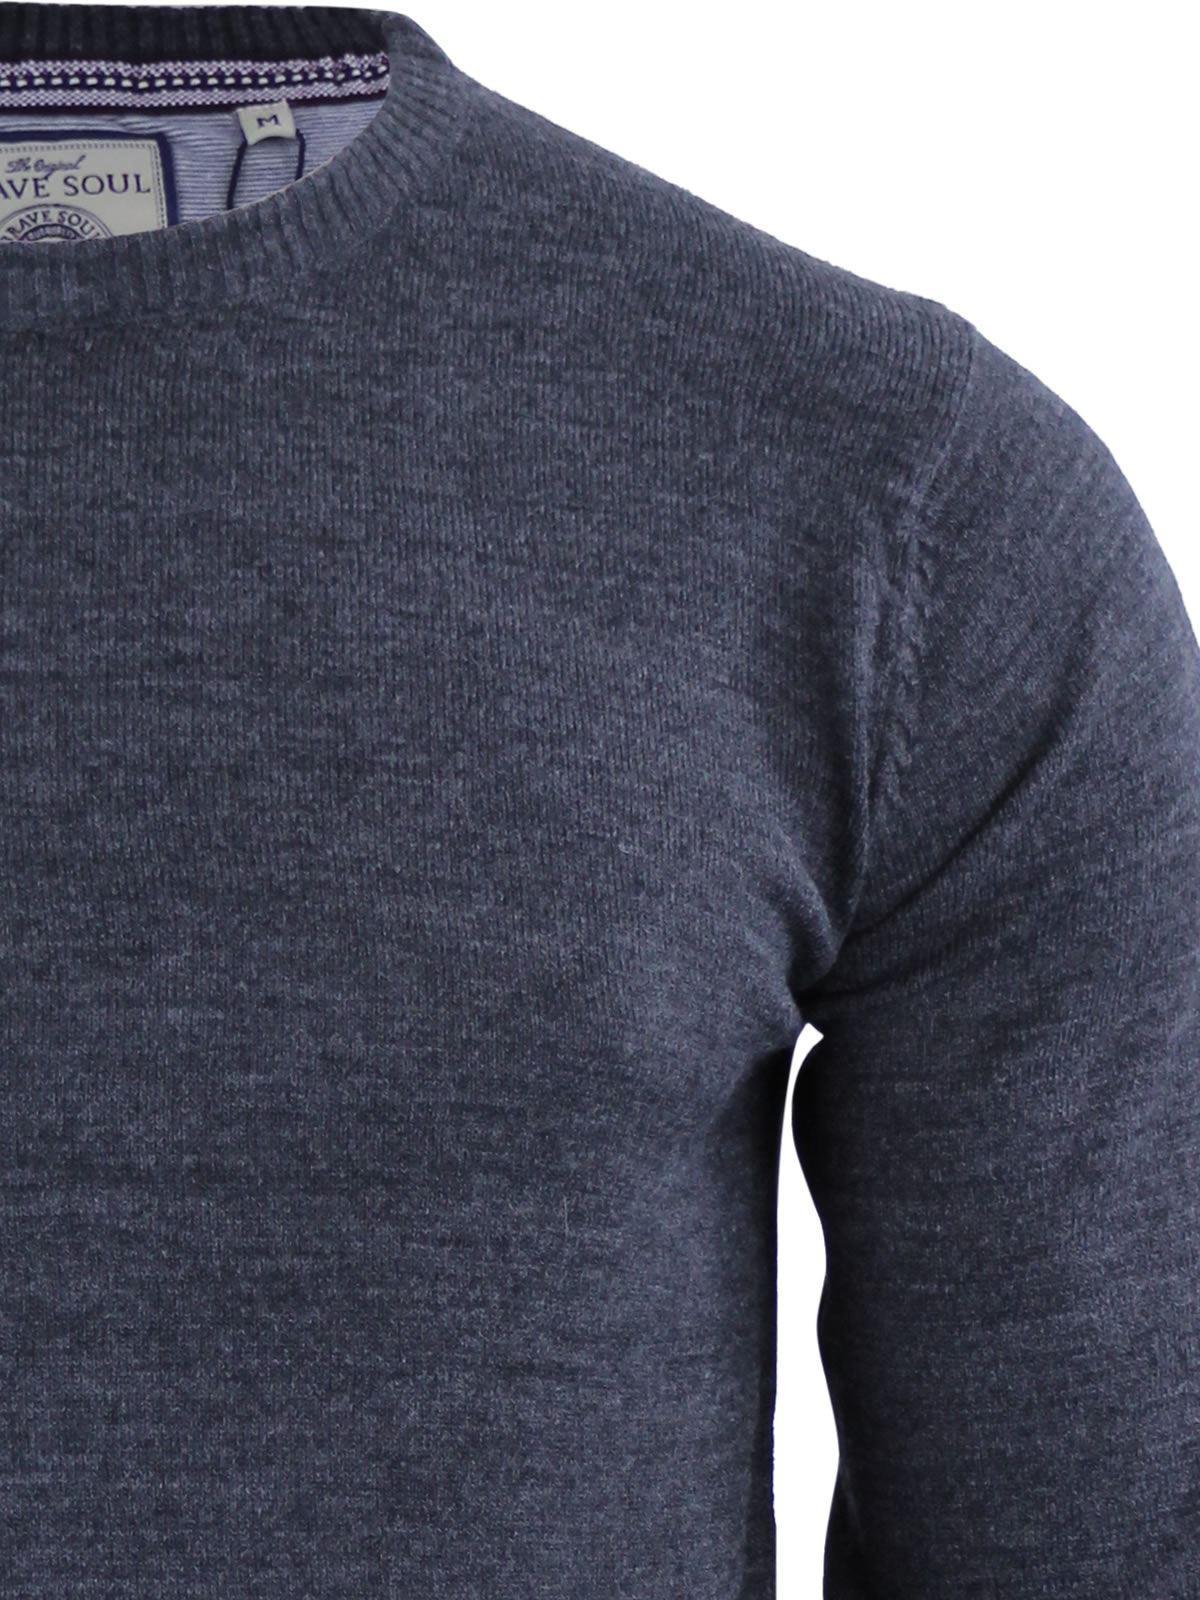 Brave-Soul-Urbain-Mens-Jumper-Knitted-Crew-Neck-Sweater thumbnail 38